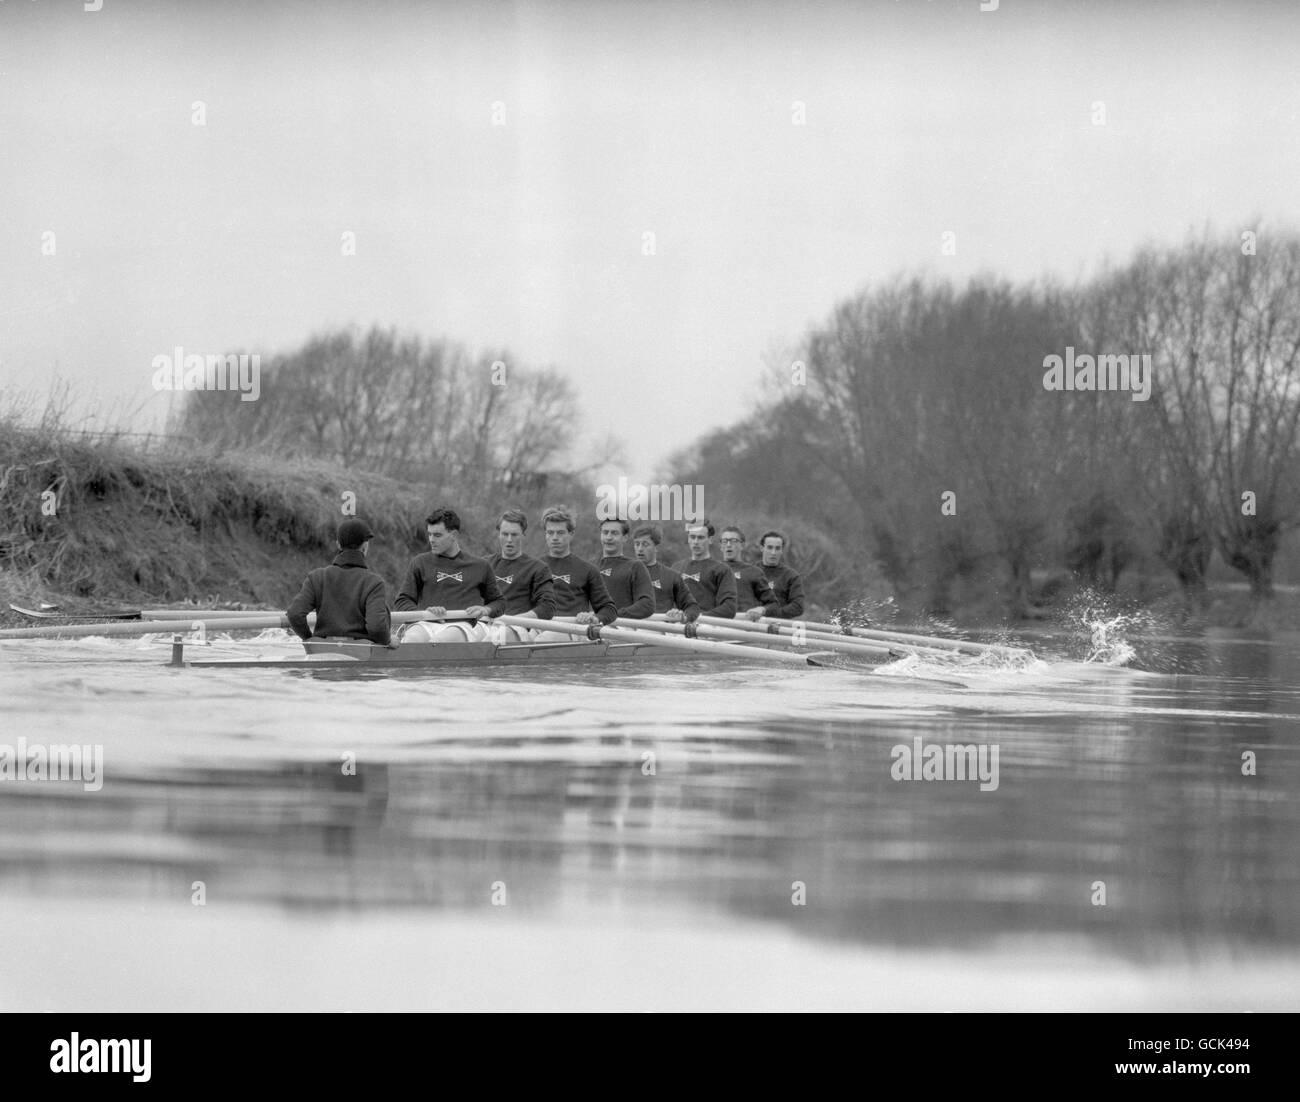 Rowing - The 108th Boat Race - Oxford University v Cambridge University - London - Stock Image